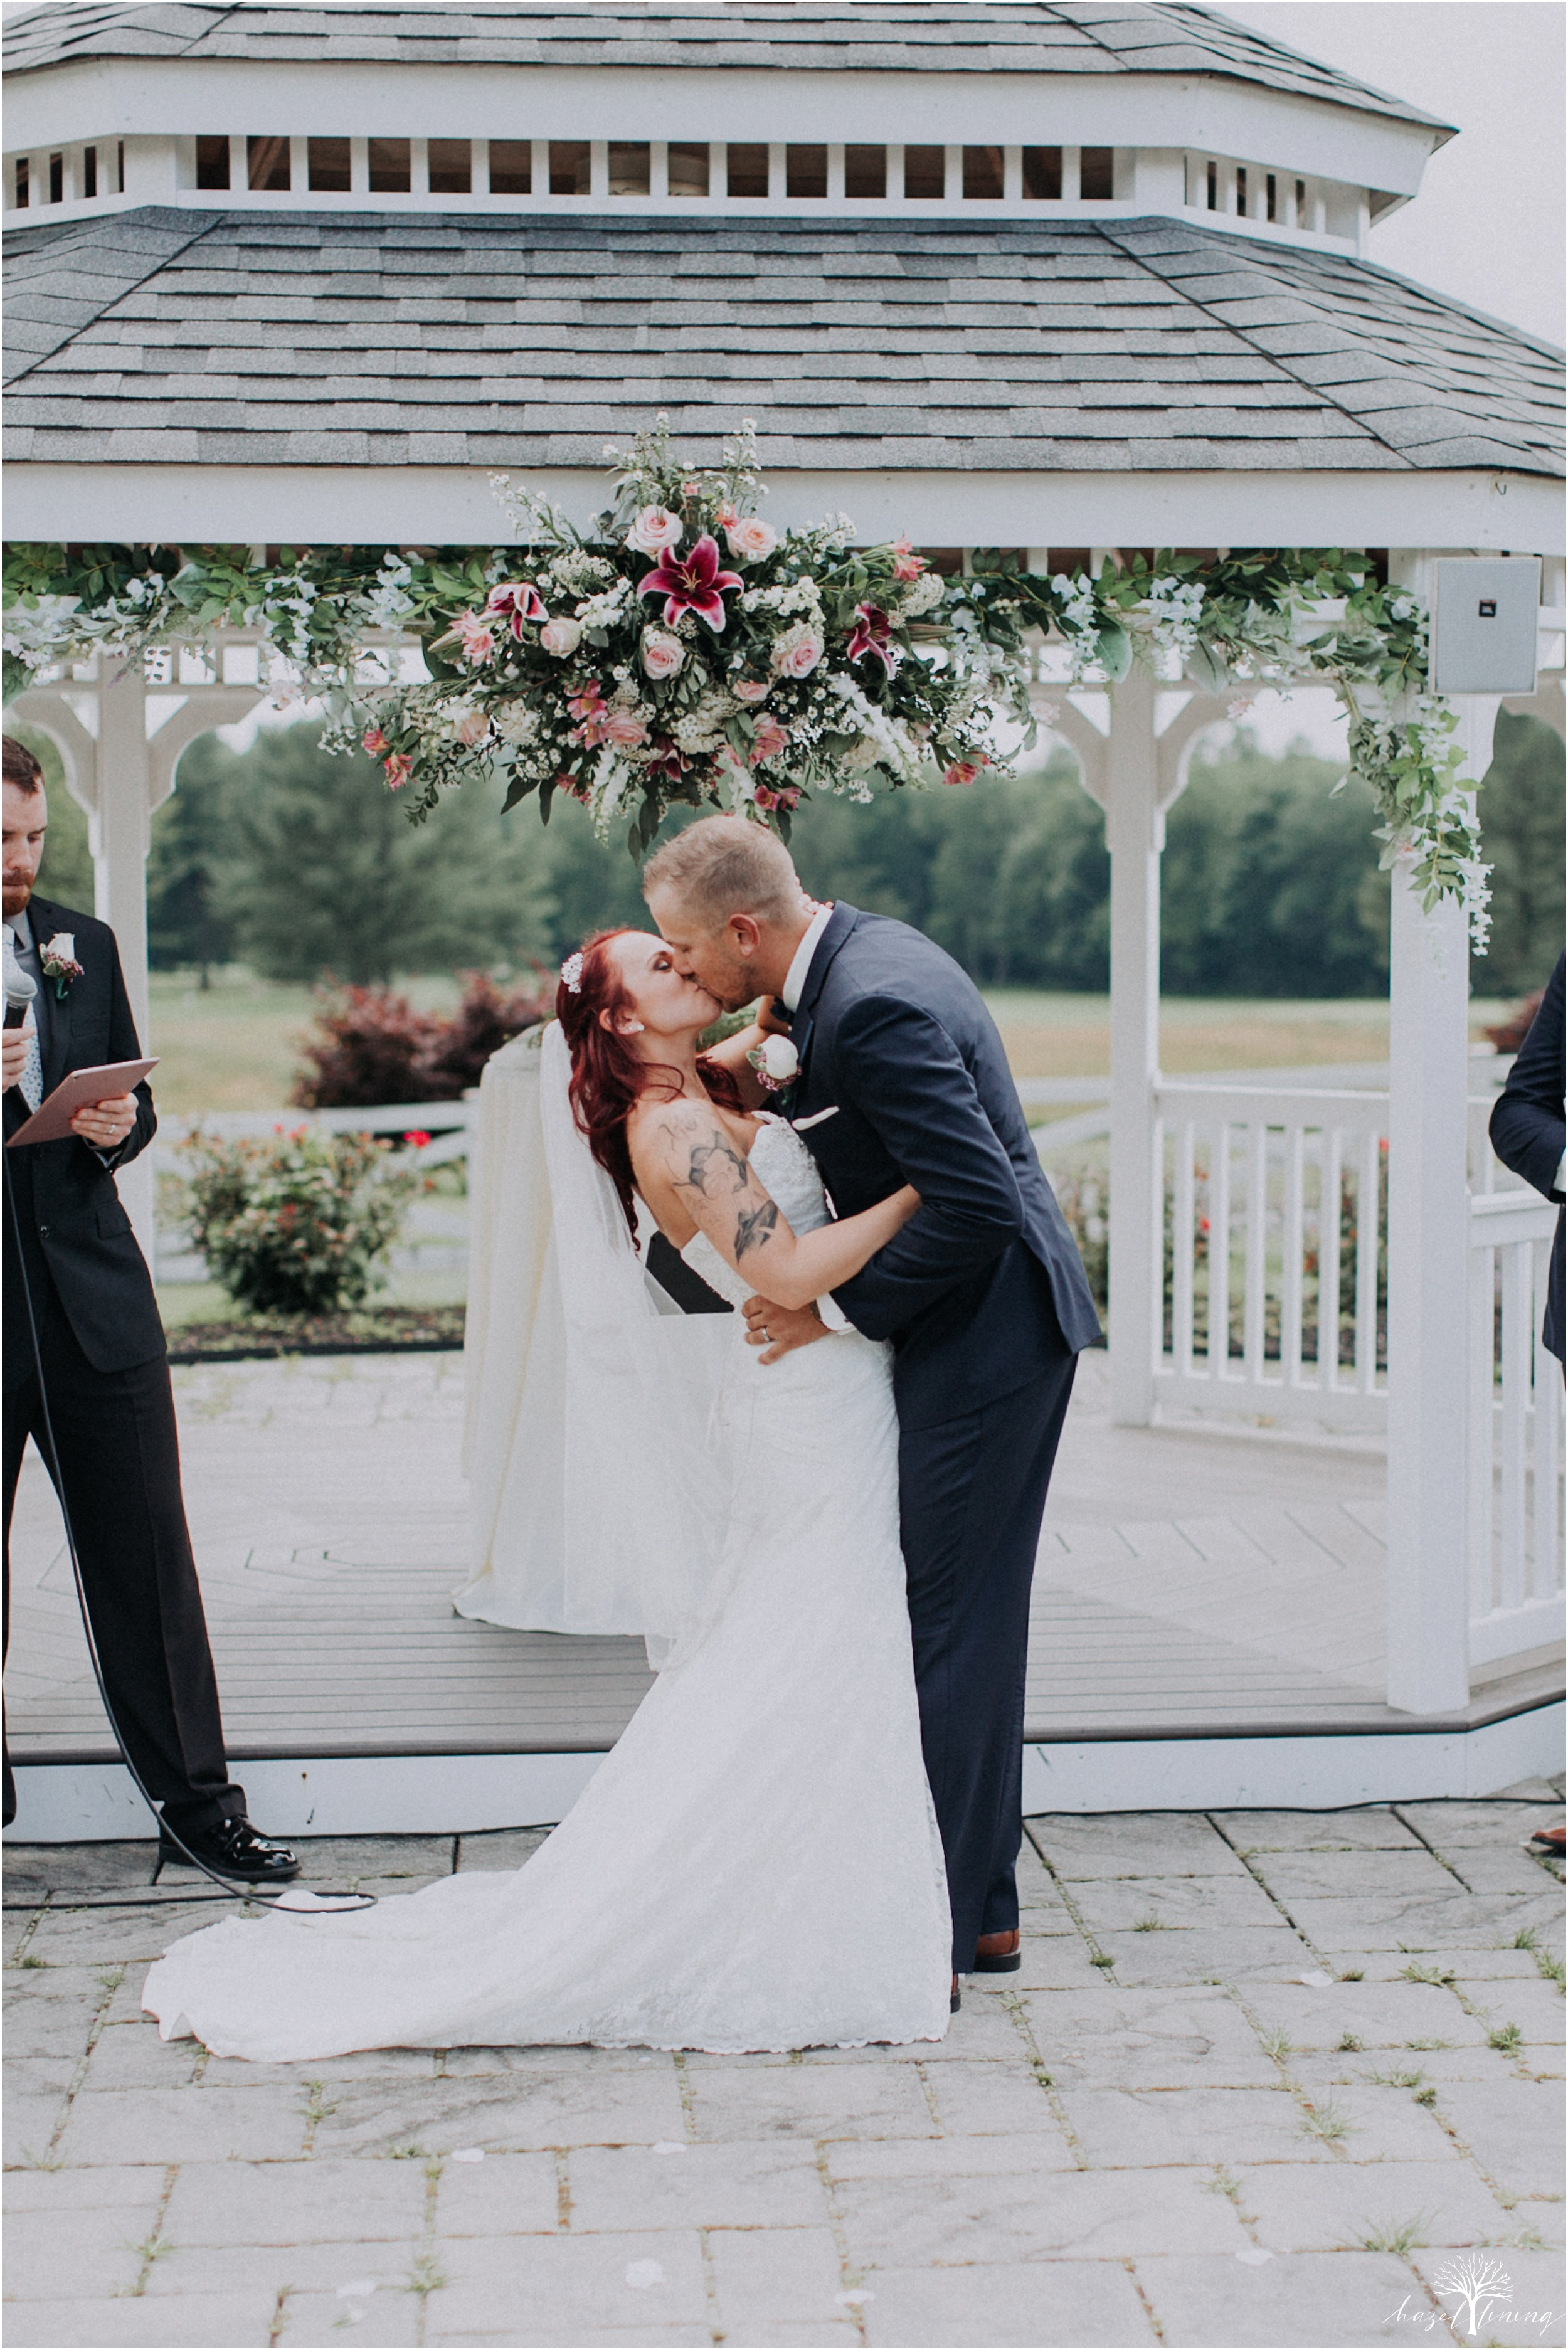 alyssa-james-stiteler-wedding-loft-and-sweet-water-cc-pennsburg-pennsylvania-hazel-lining-travel-wedding-elopement-photography_0061.jpg